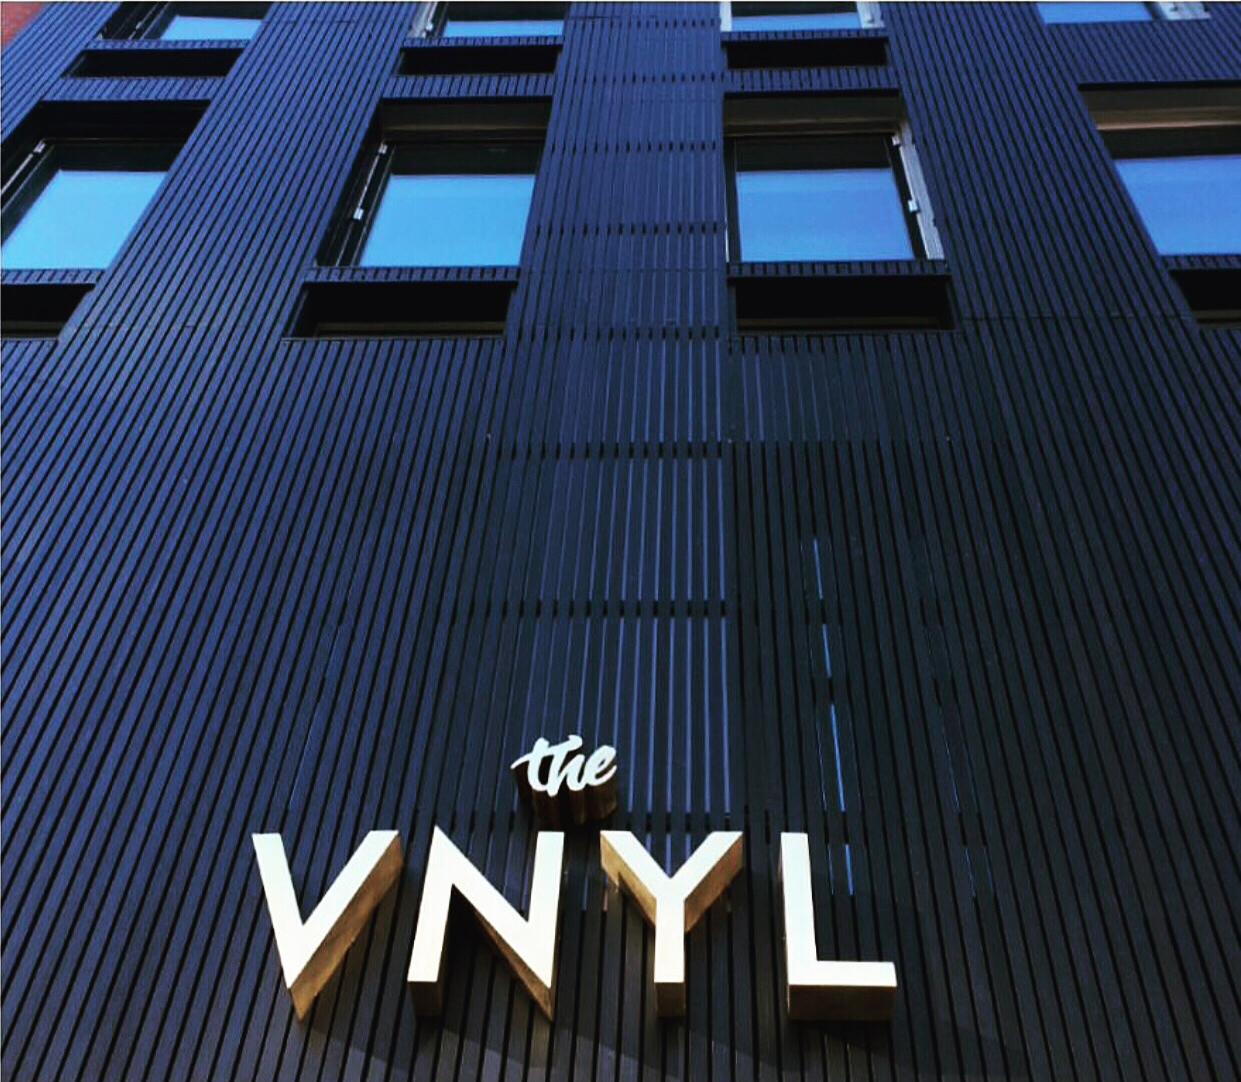 The VNYL, New York